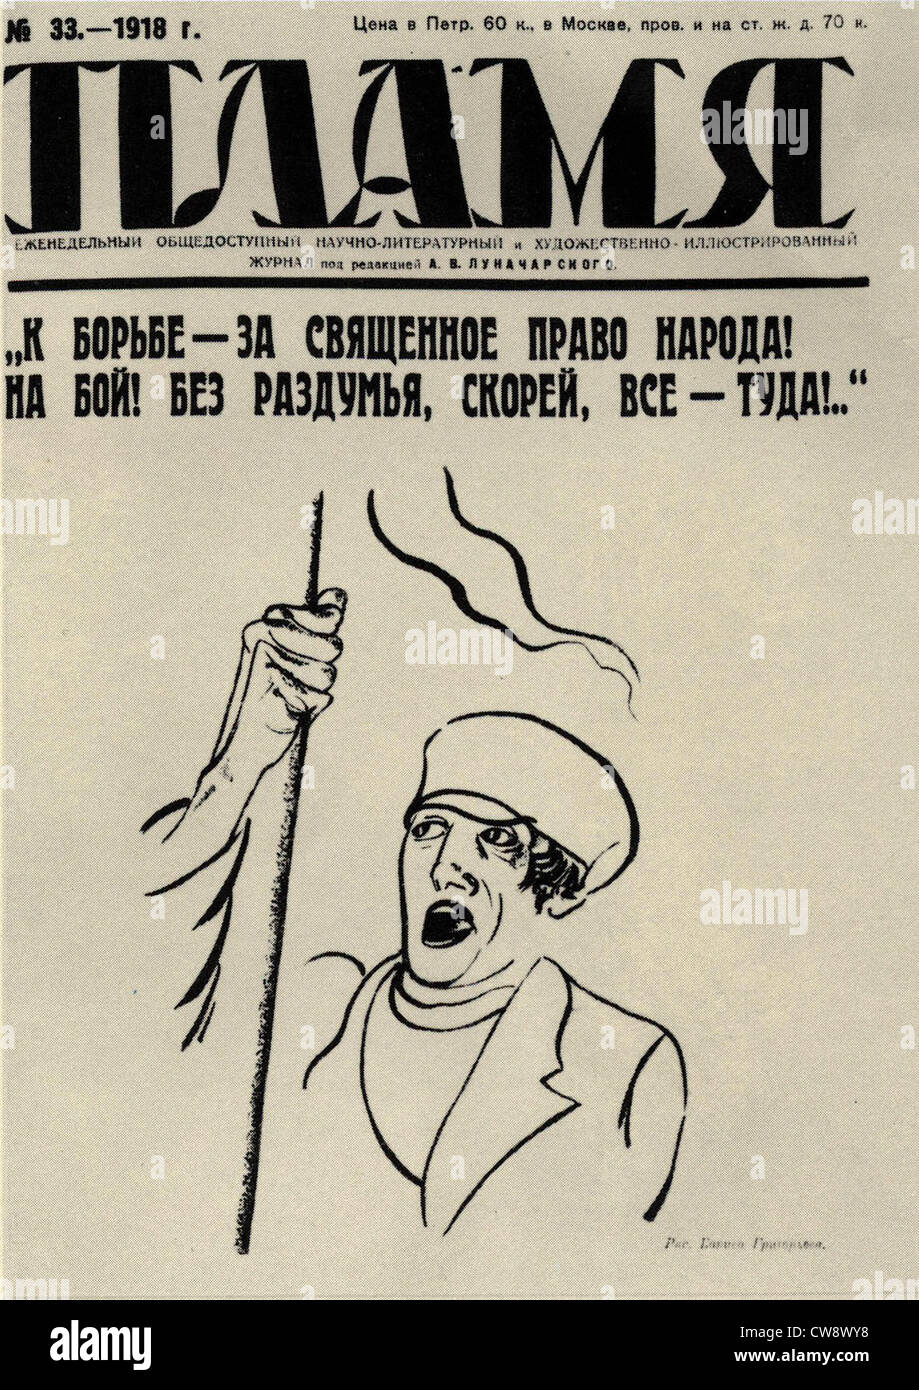 Boris Grigoryev - Cover magazinel 'Plamia' (The Flame) no. 33 - Stock Image